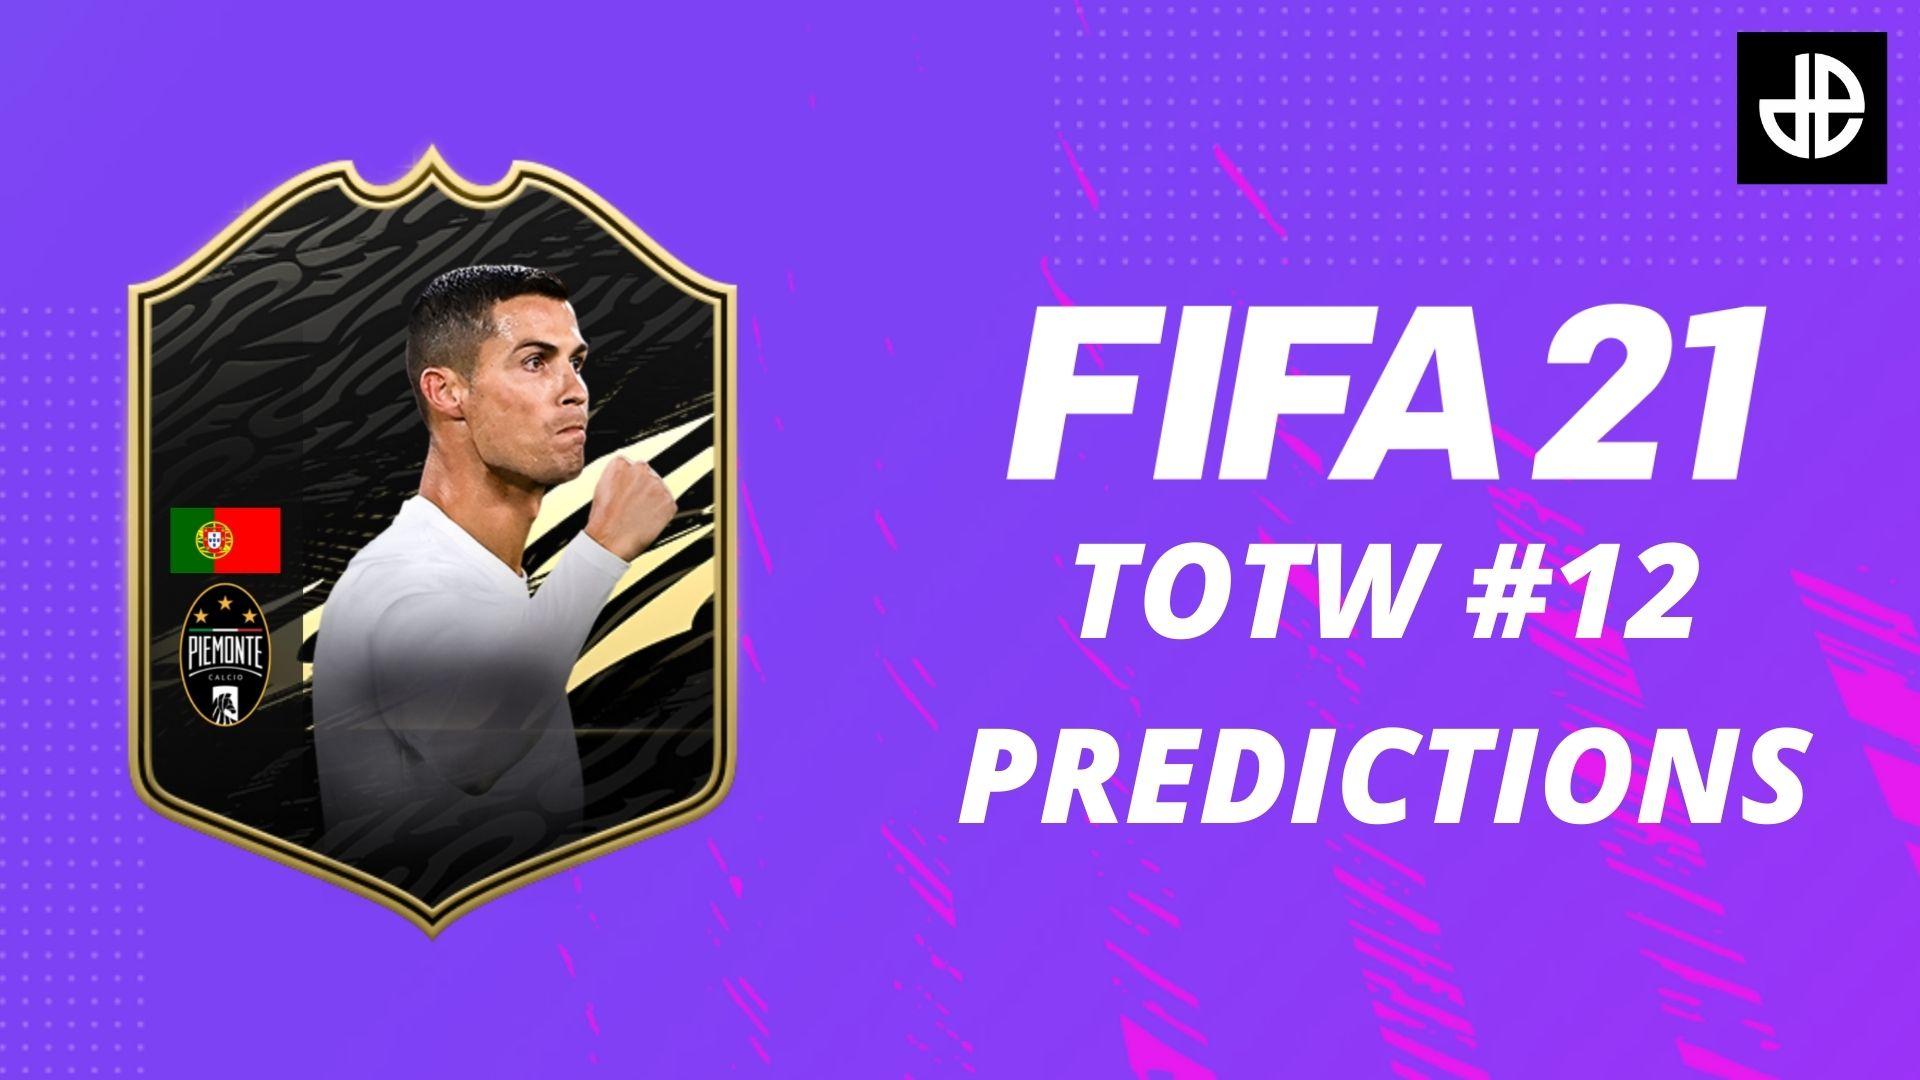 FIFA 21 TOTW 12 predictions with a Ronaldo card